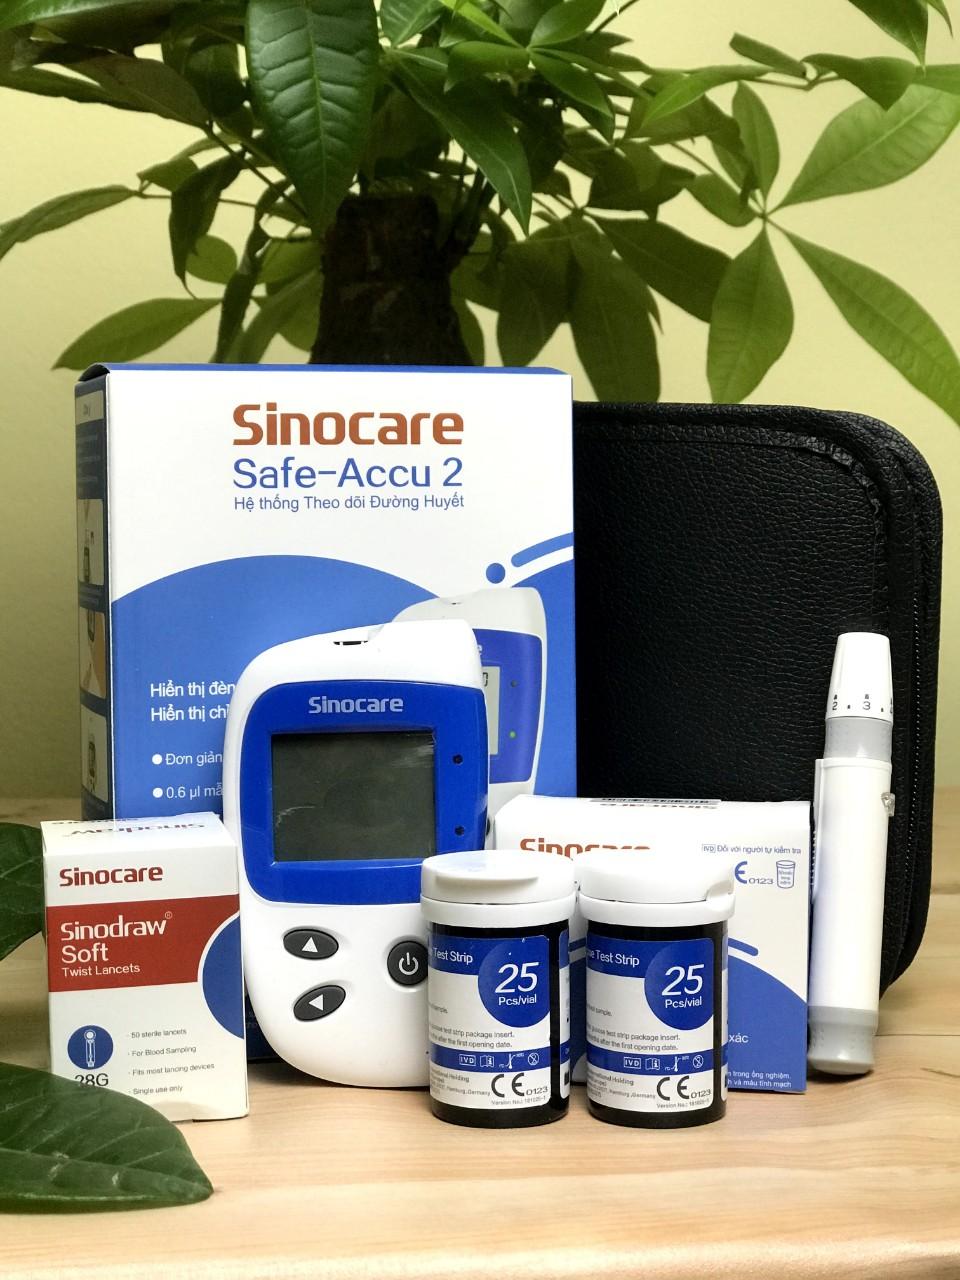 Máy đo đường huyết Sinocare Safe accu 2